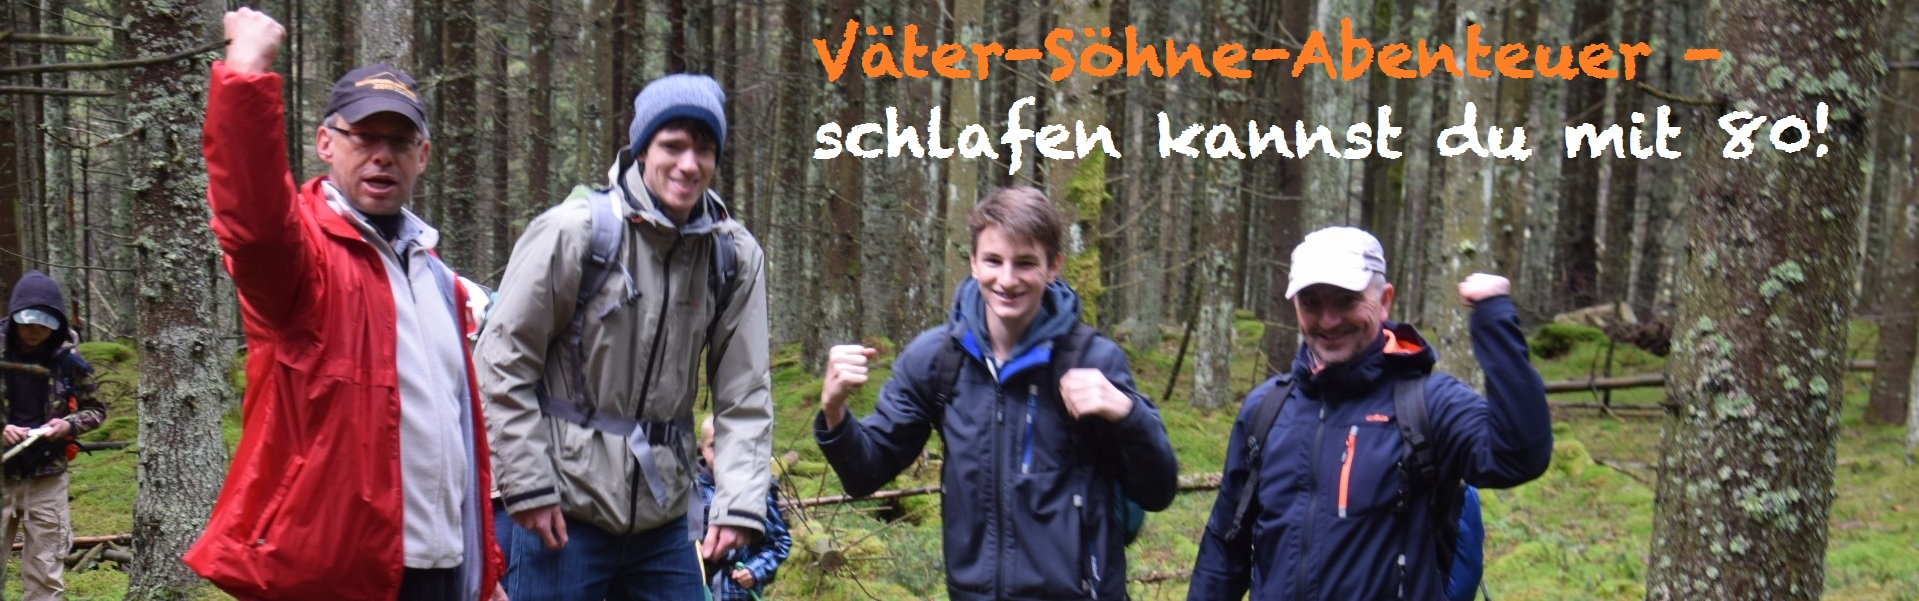 Vaeter_Soehne_Abenteuer_WoE_Schwarzwald2.jpg